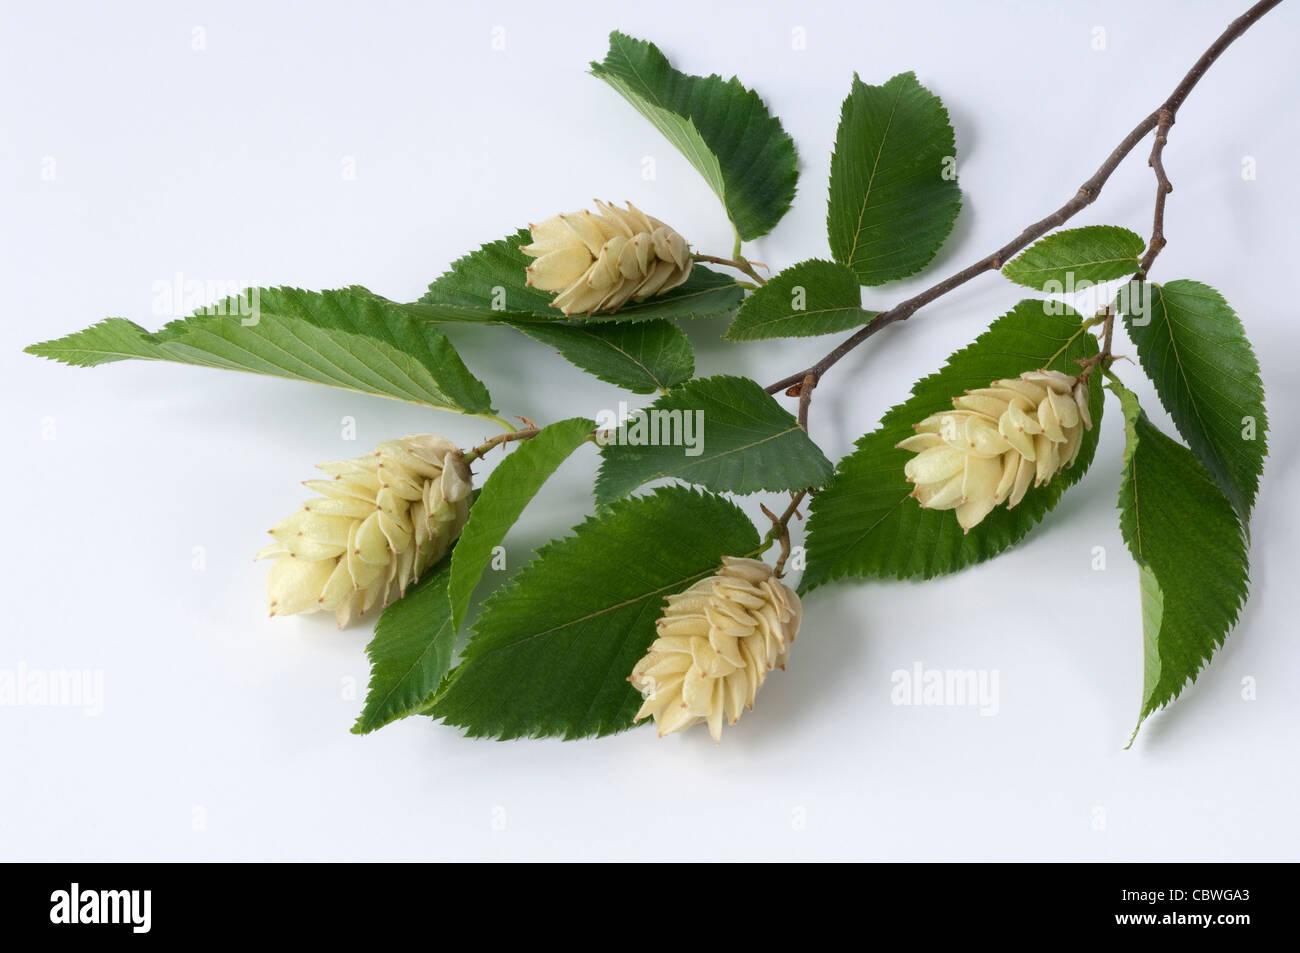 Seltene,Hop Hainbuche,Ostrya Carpinifolia,Hardy Blühender Baum,Prächtigen Fruit